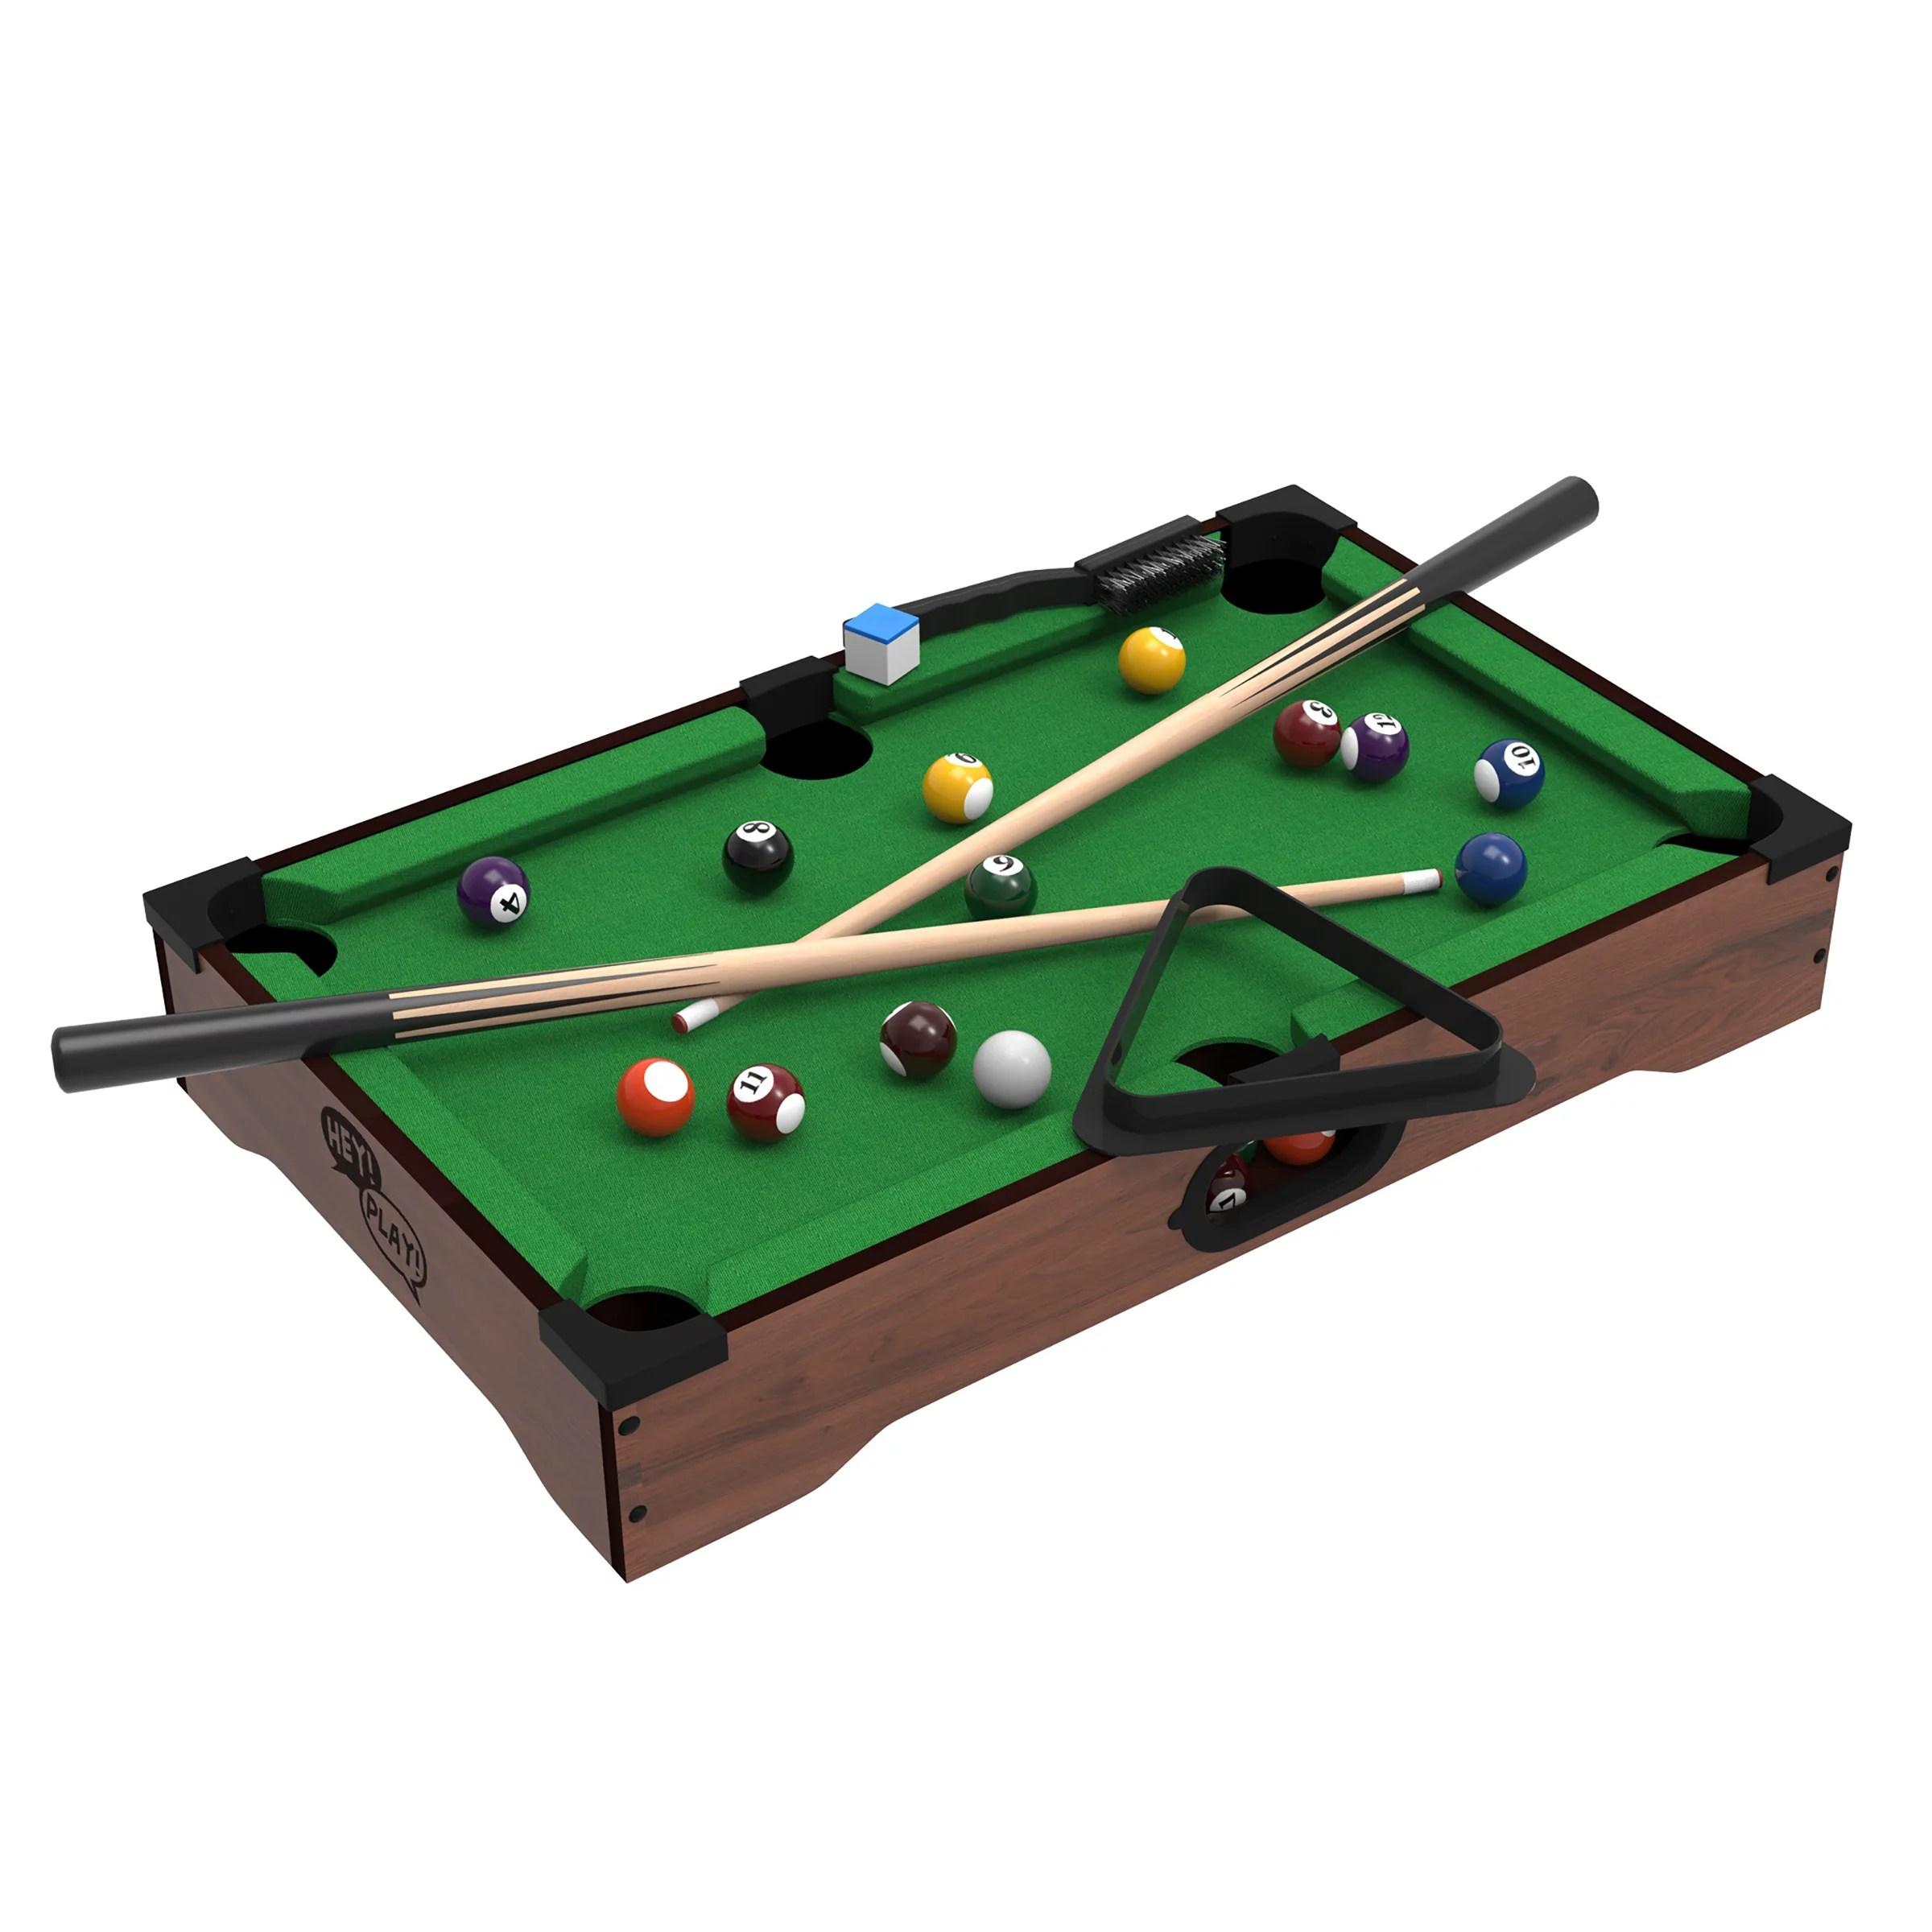 Trademark Games Mini Table Top Foosball Pool Table